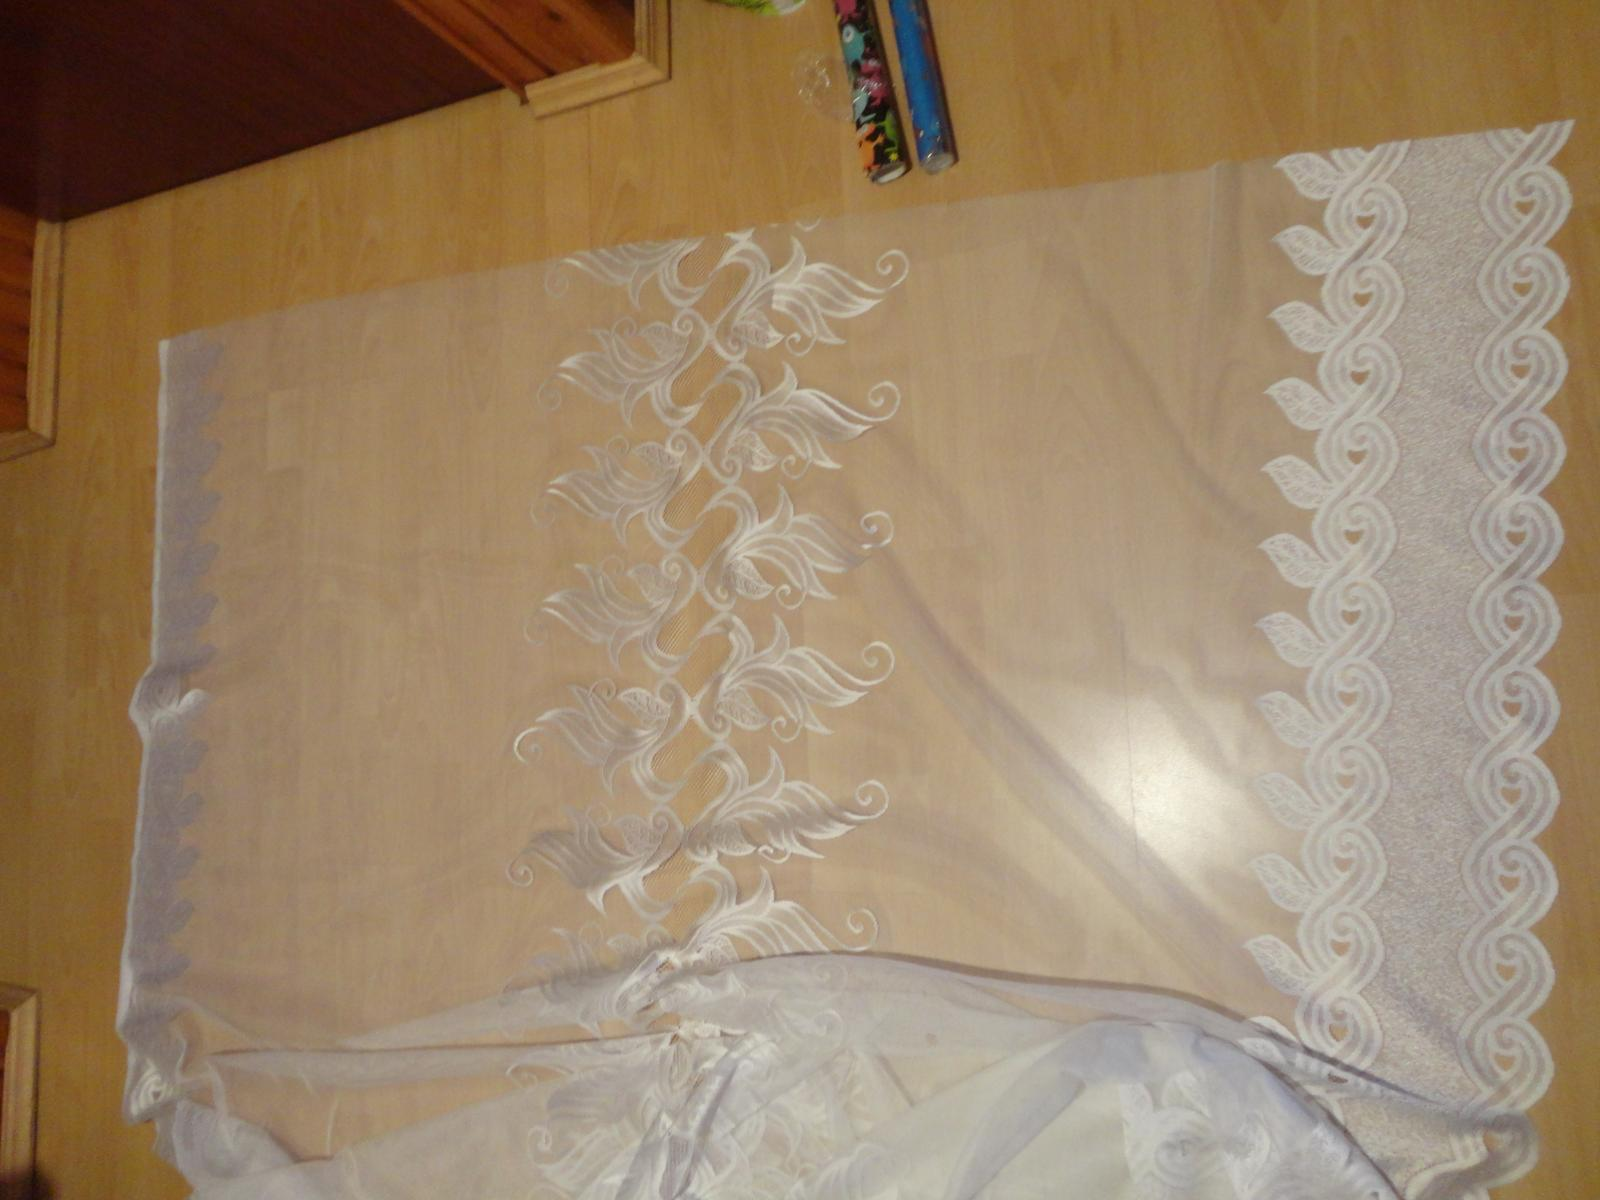 záclona 3,70 x 1,60 m - Obrázok č. 1